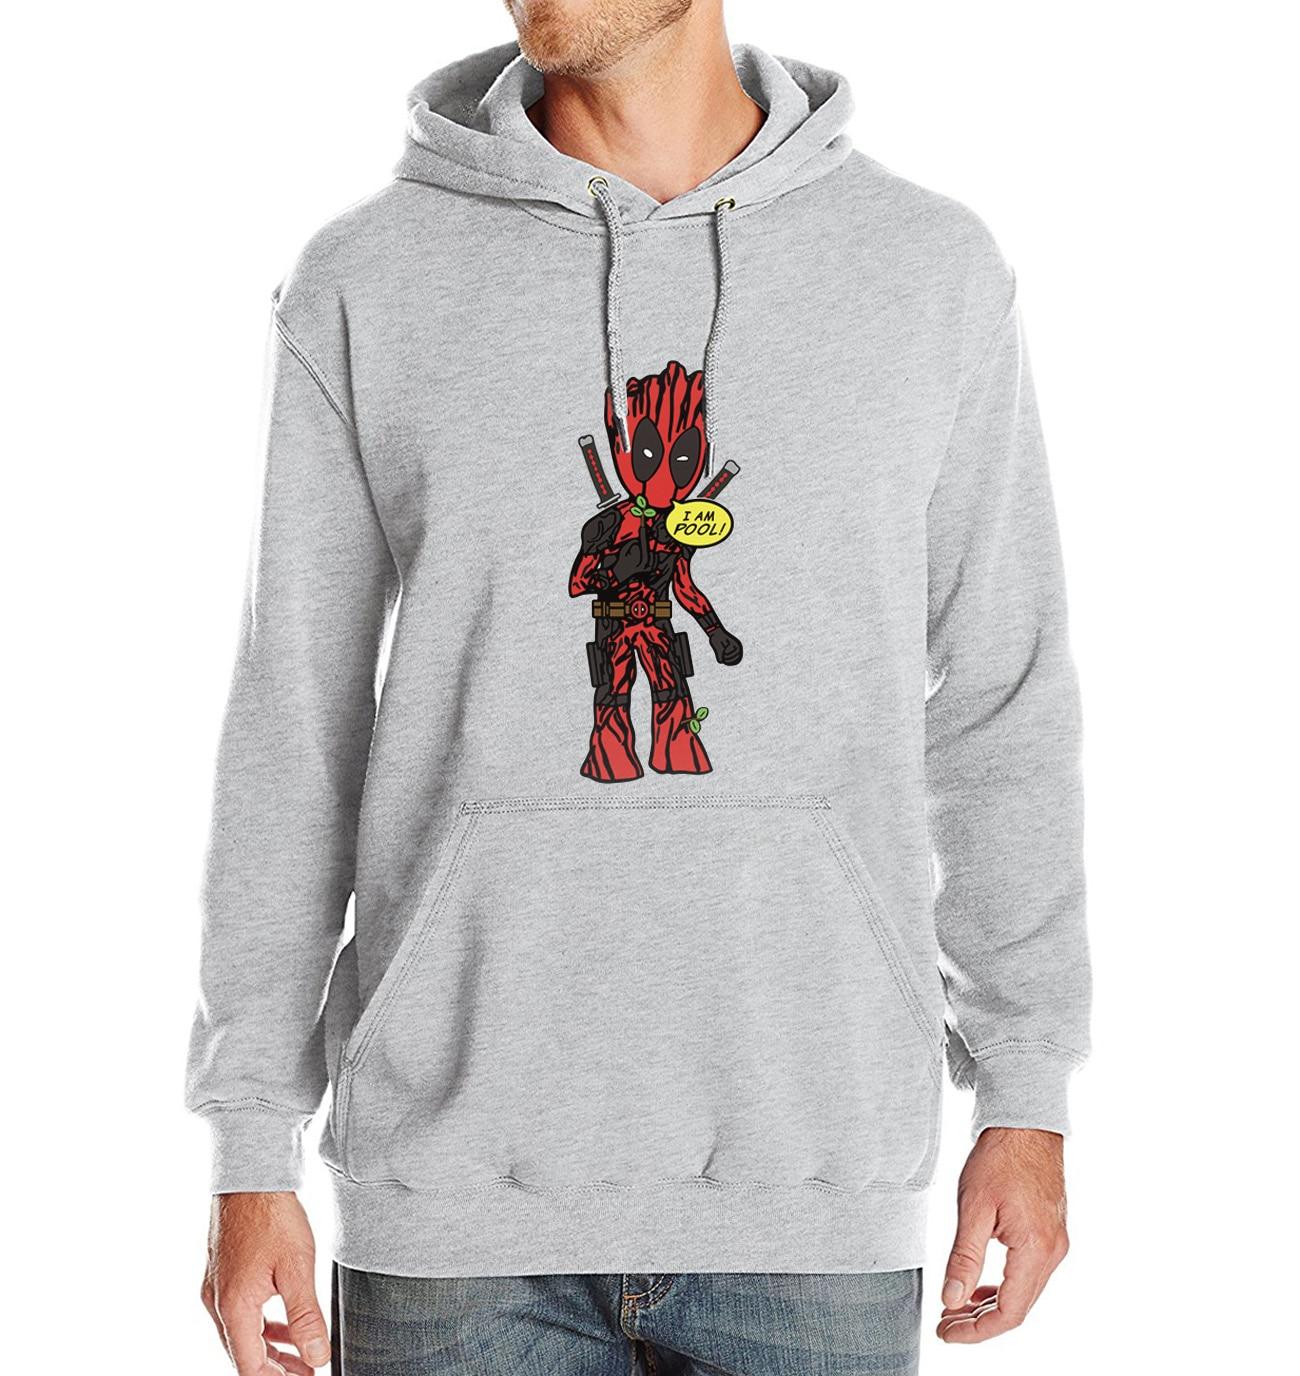 Sweatshirt For Men 2018 New Autumn Winter Hoody Print DEADPOOL Funny I'M GROOT Cartoon Hoodie Superhero Harajuku Men's Hoodies